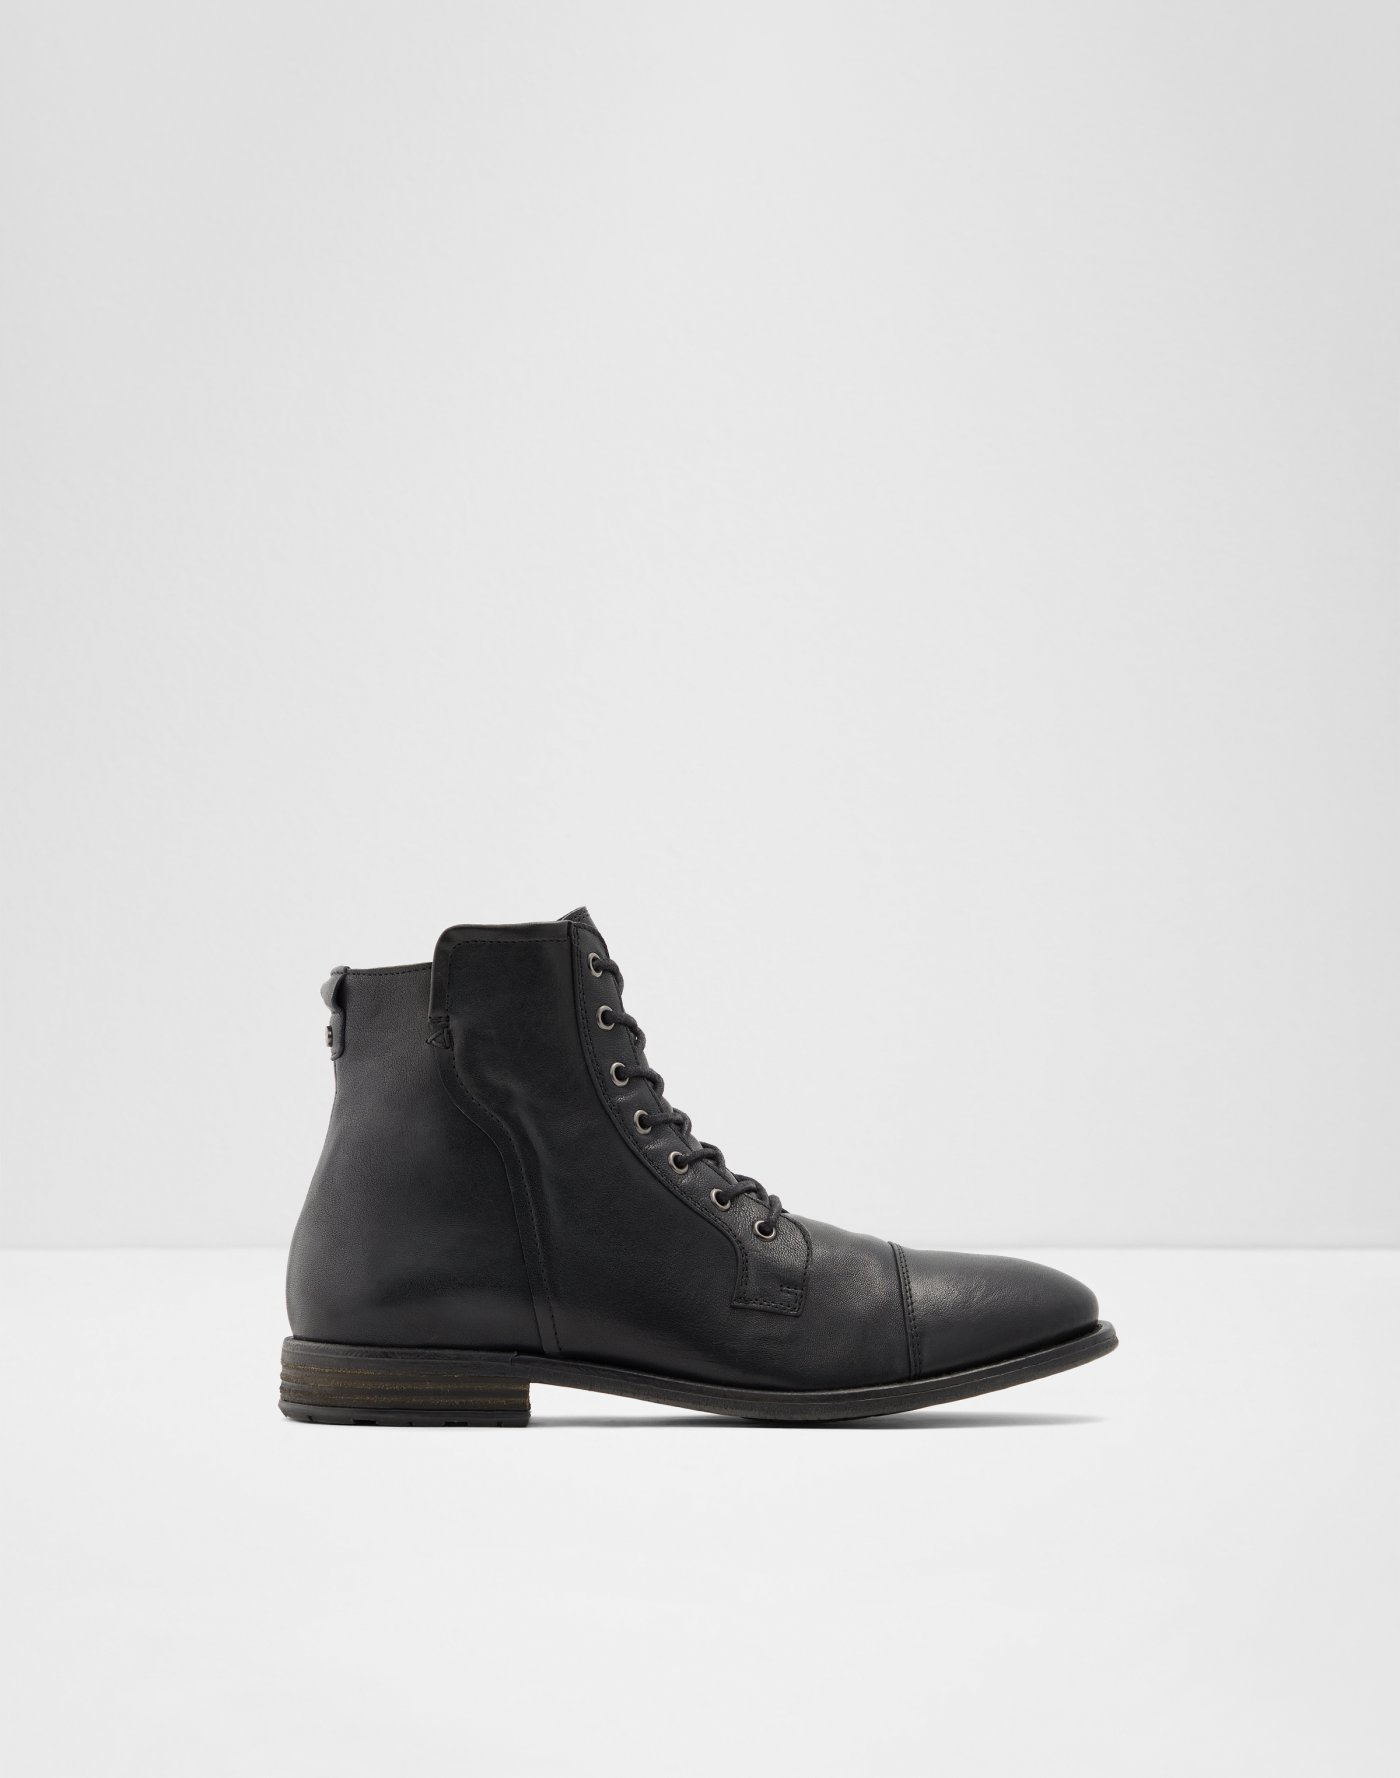 48d9bfb0339b Men's Boots   Formal & Casual   ALDO Canada   ALDO Canada